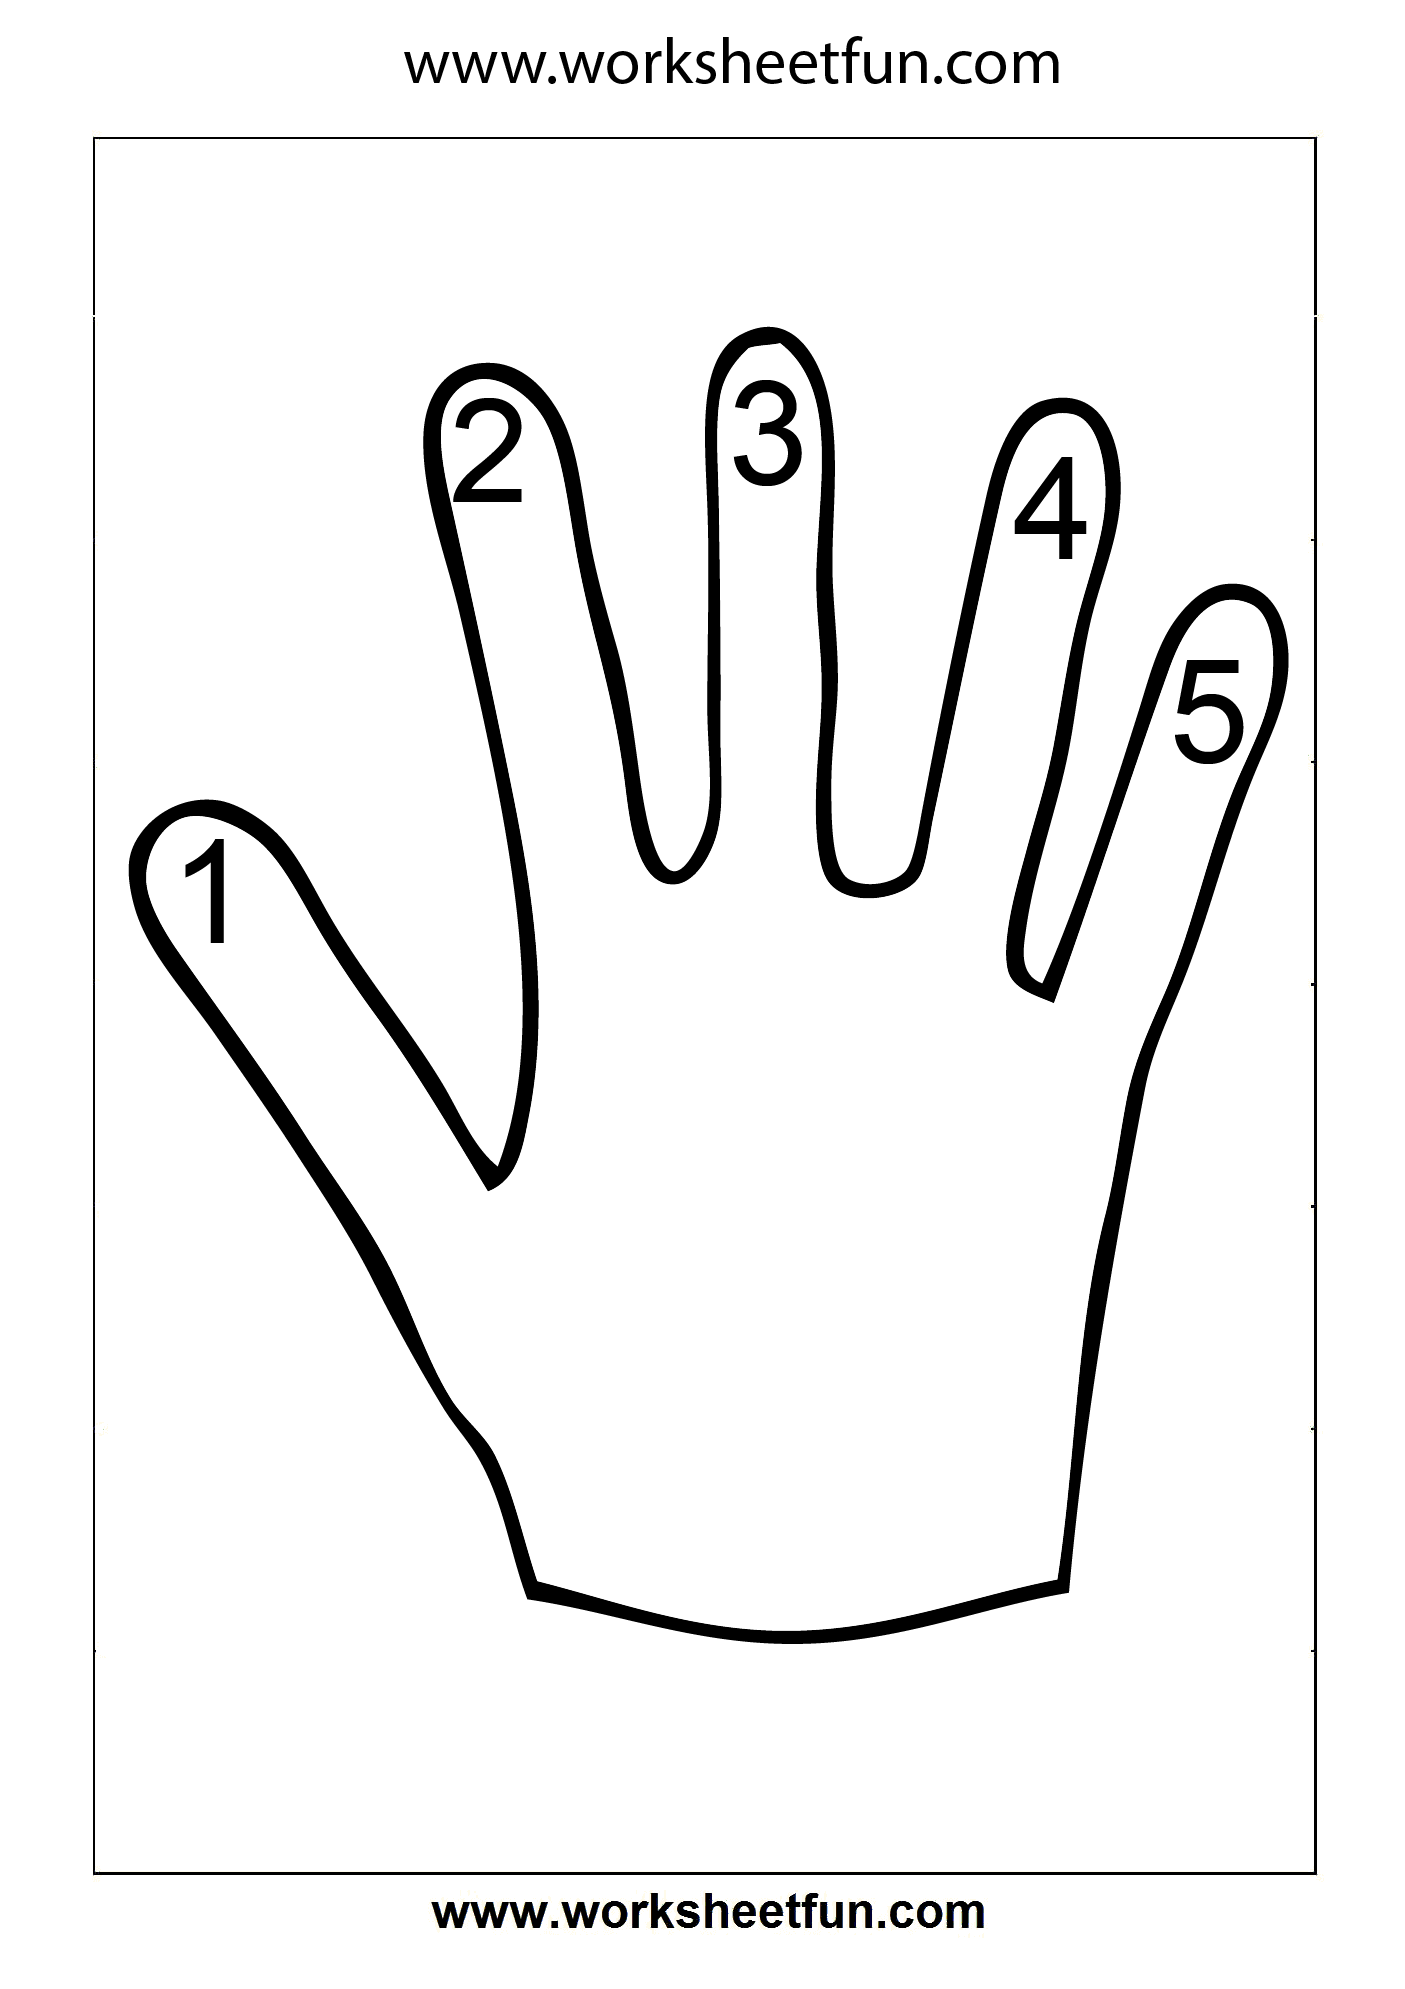 Number Counting 1 5 Free Printable Worksheets